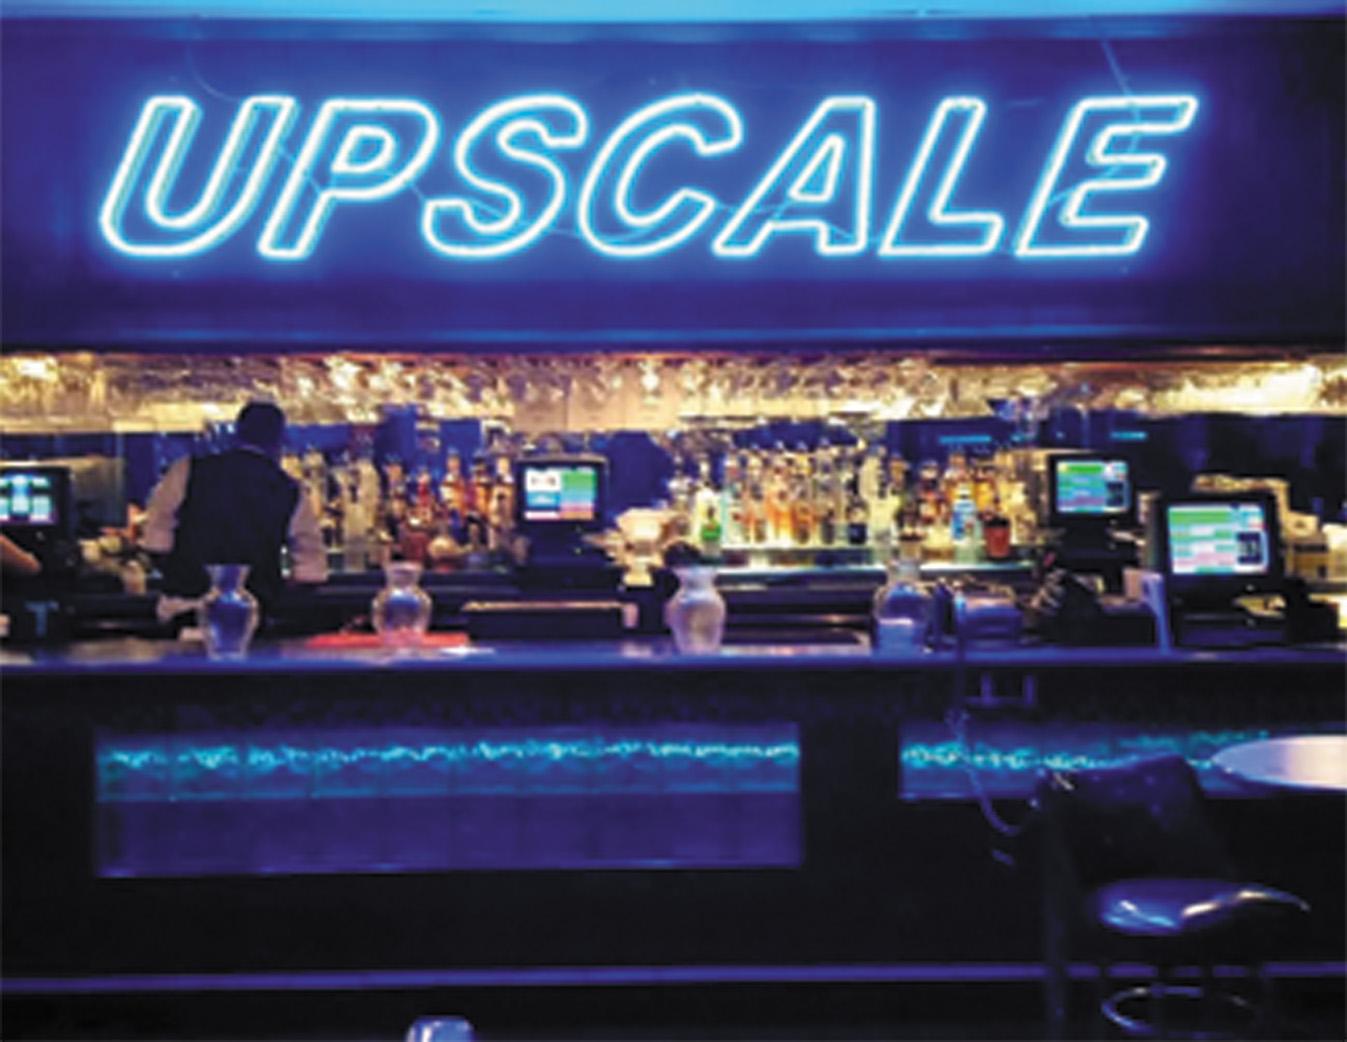 Upscale Night Club Of Virginia